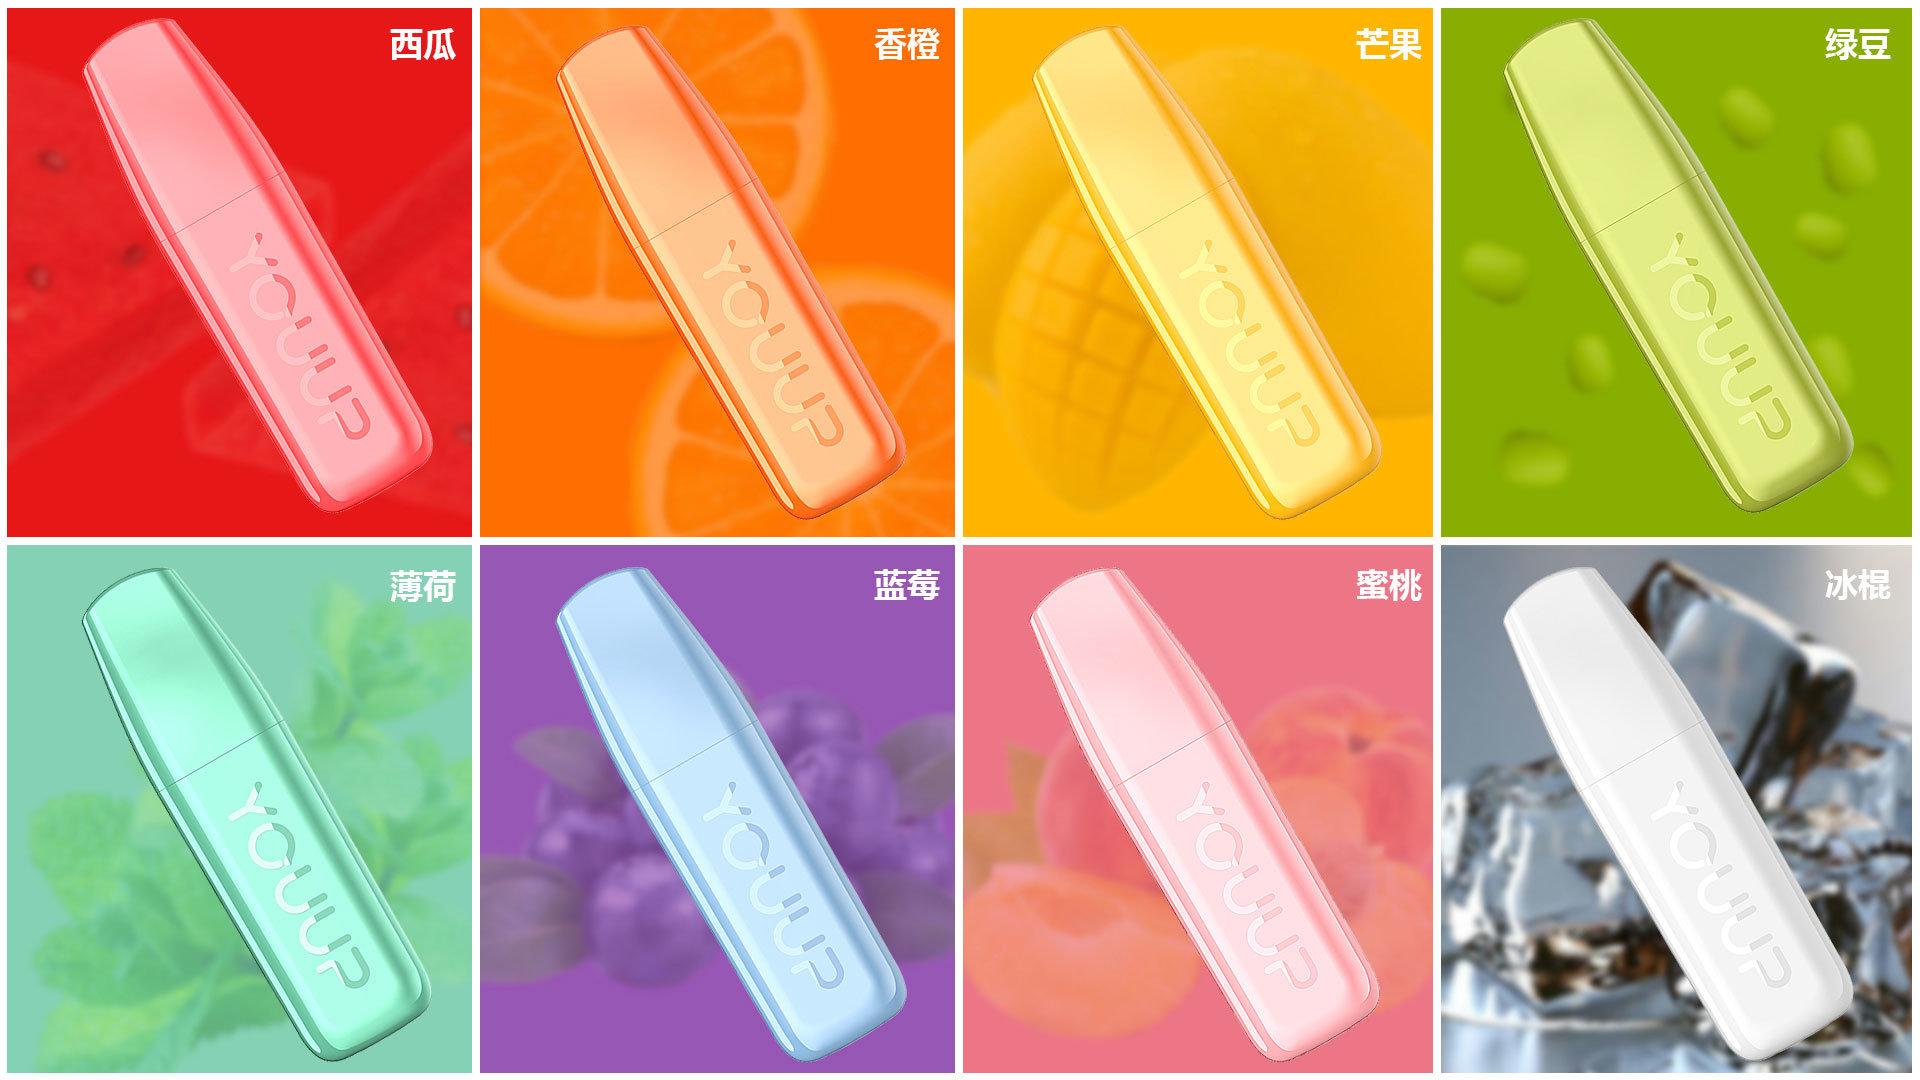 Kingtons Youup 113 High Quality Disposable Vape Pen